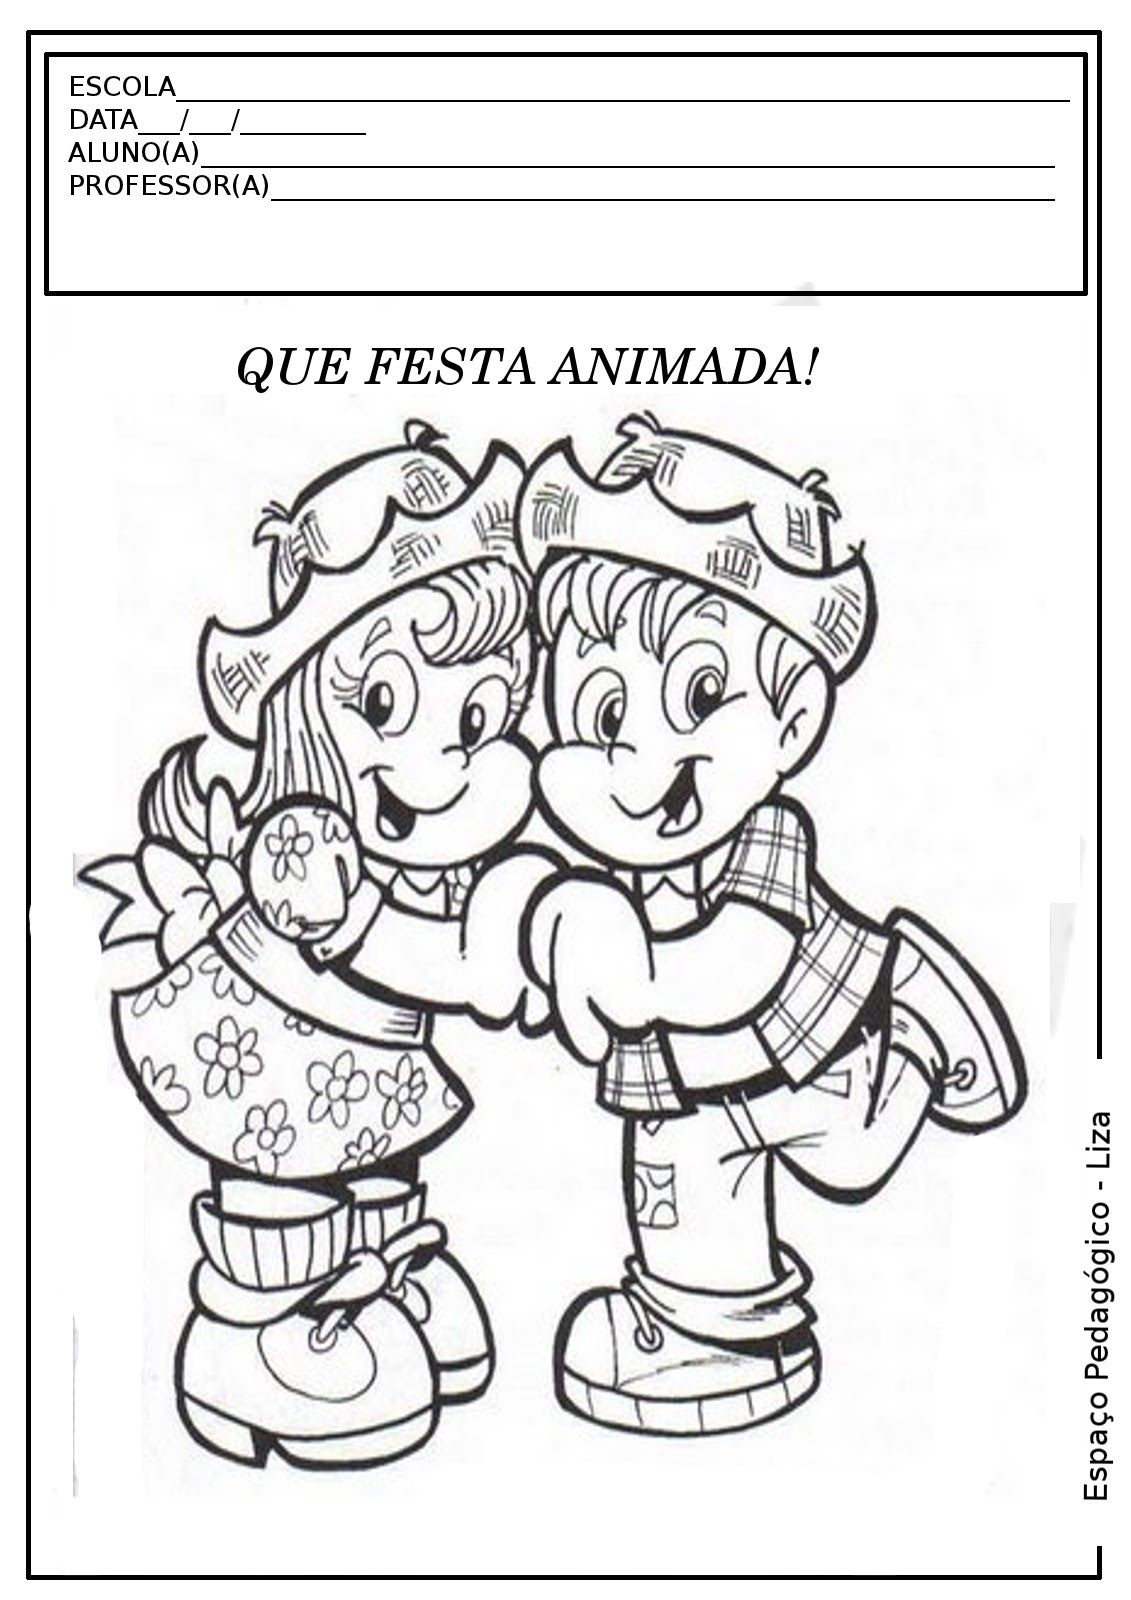 Festa Junina Atividade Colorir Pintar Imprimir 2 Jpg 1131 1600